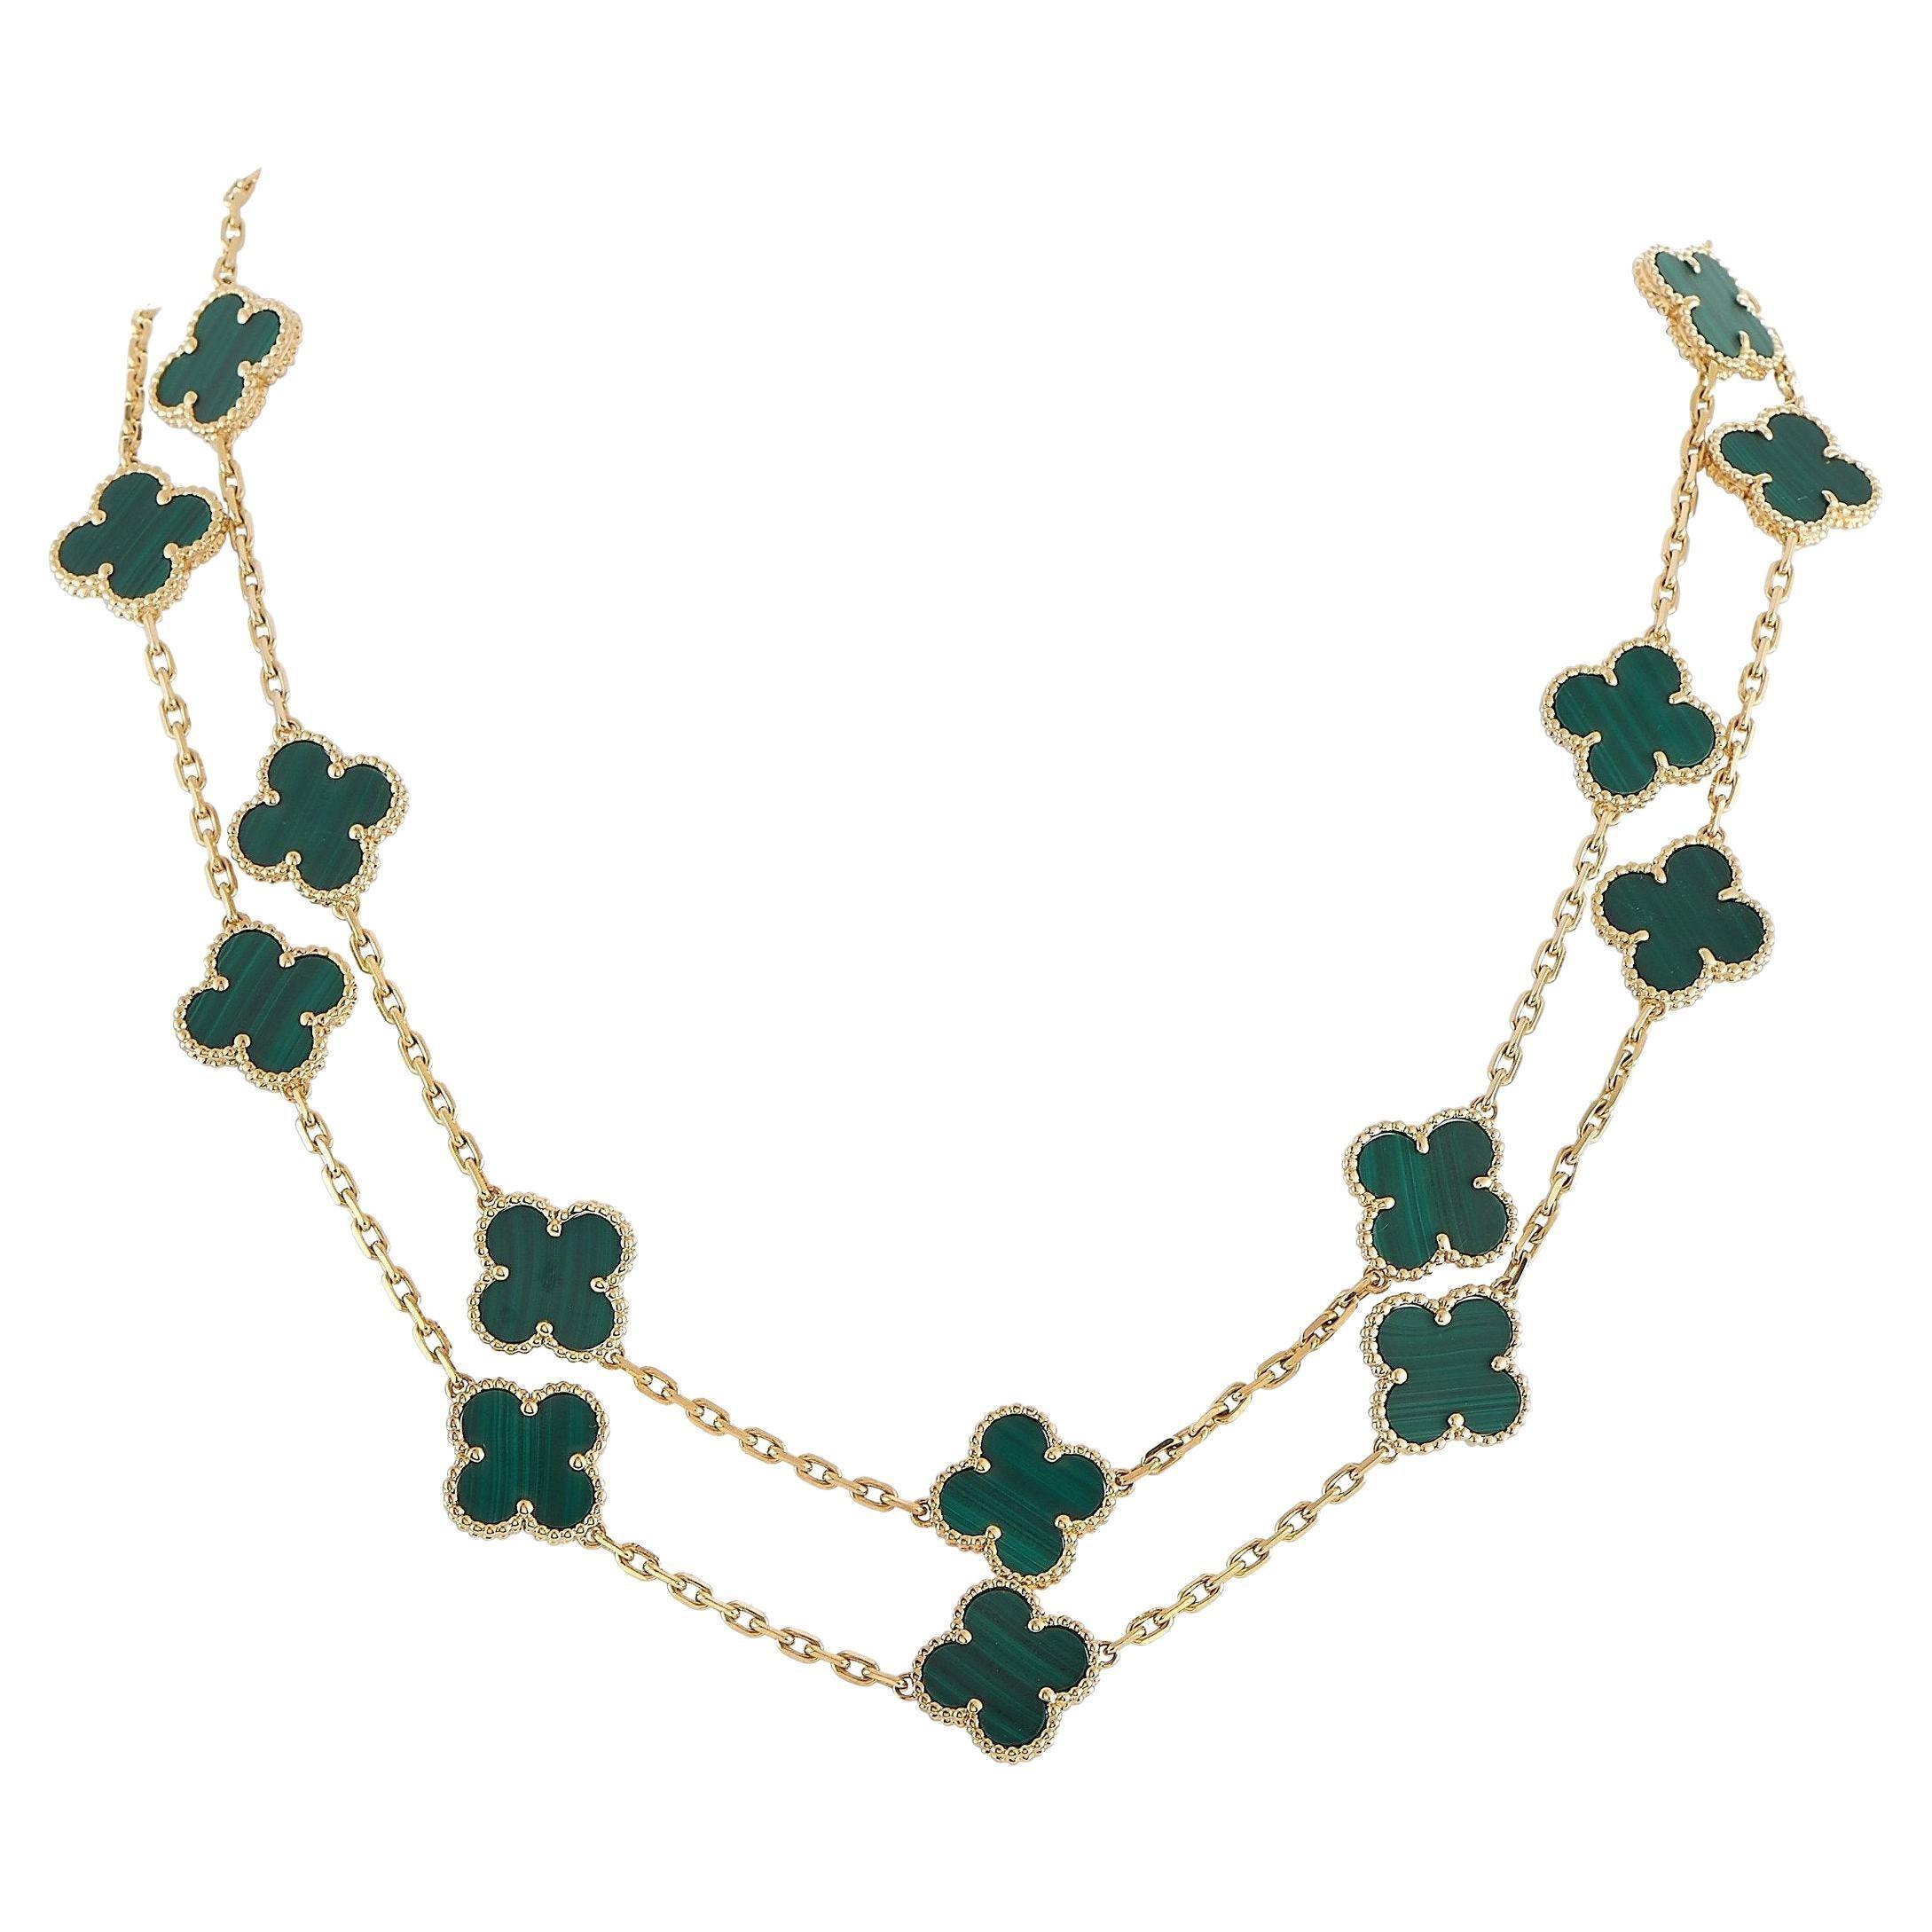 Van Cleef & Arpels Alhambra 18K Yellow Gold Malachite 20 Motif Necklace